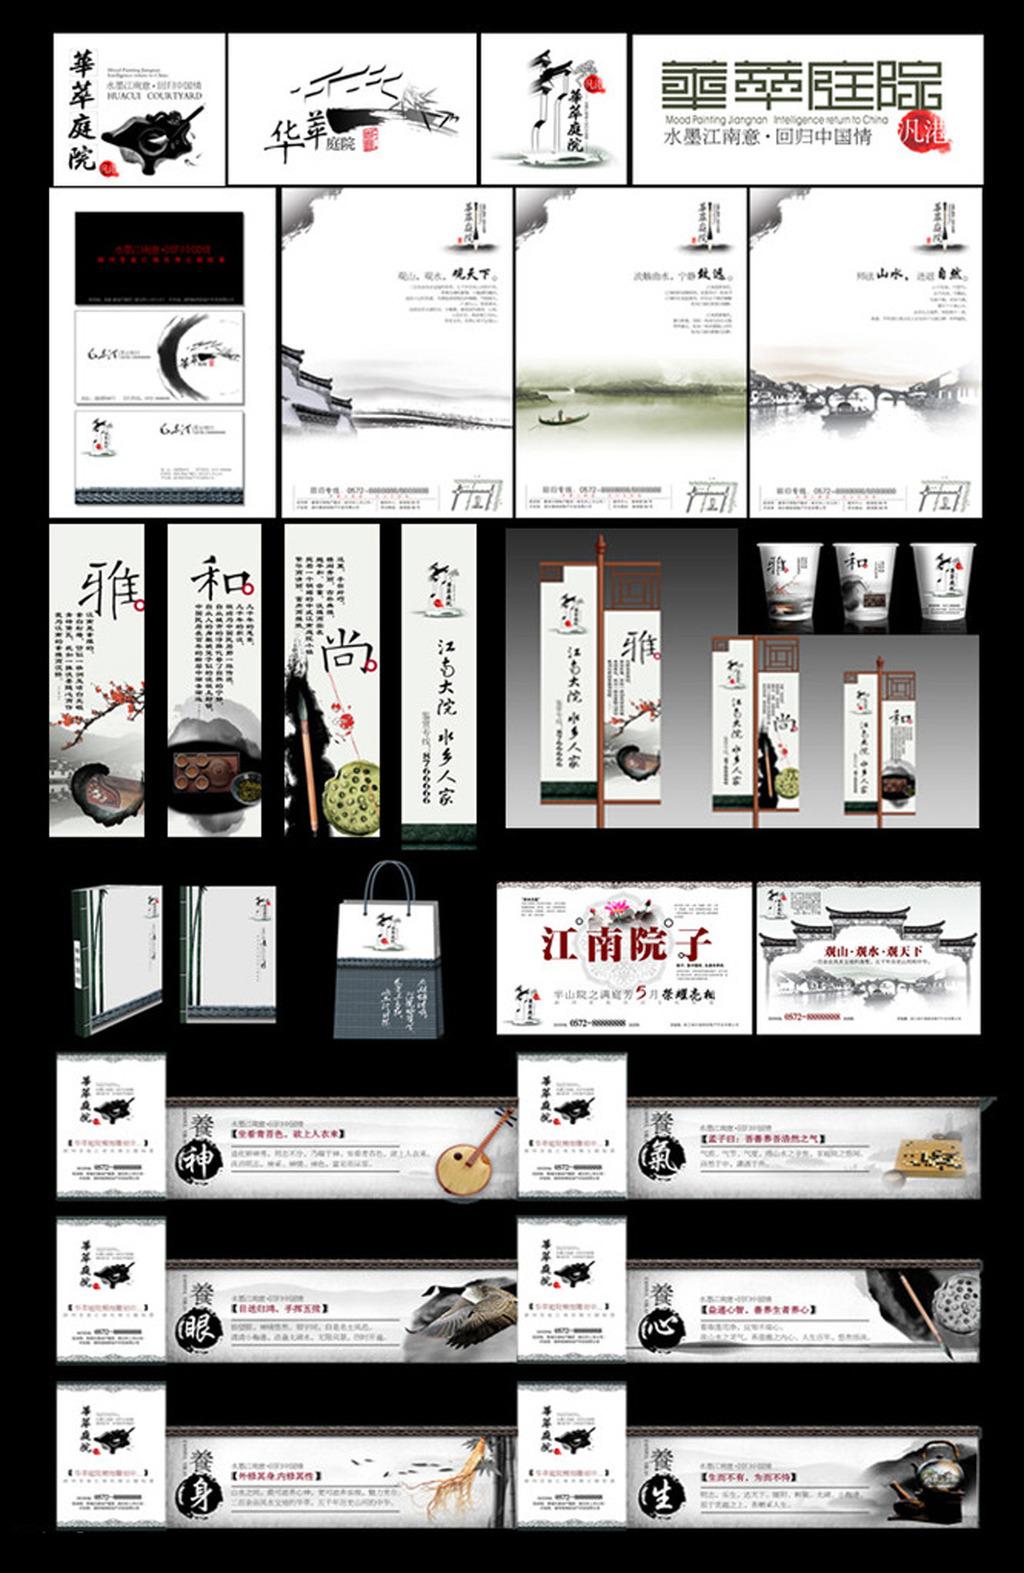 vi设计手册模板下载 vi设计手册图片下载 企业vi模板 vi设计 vi矢量